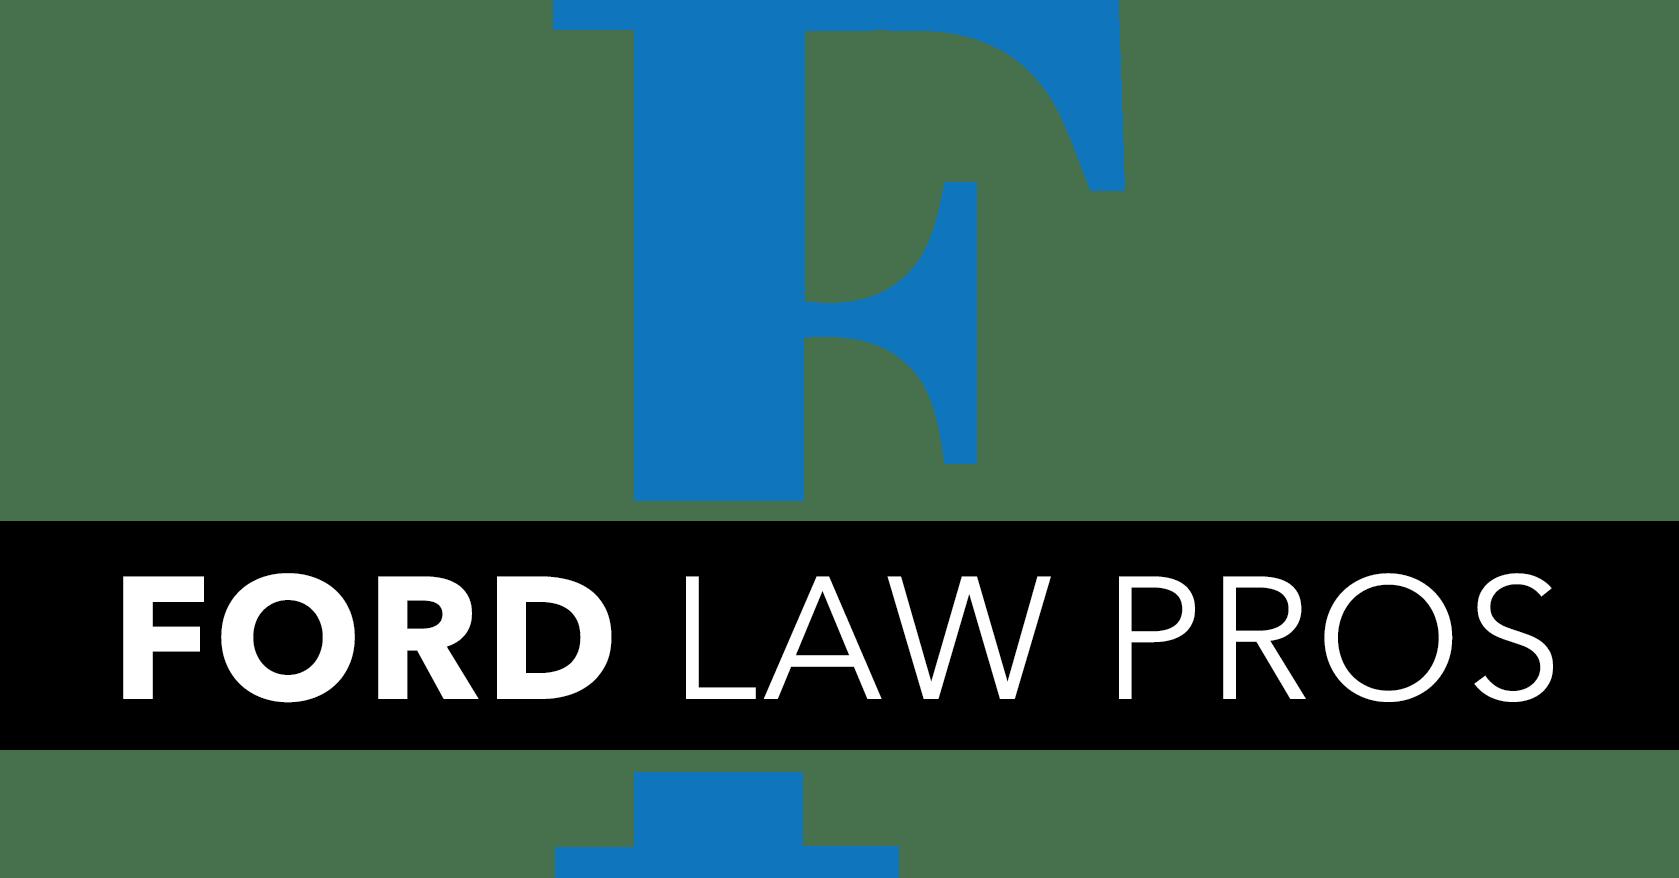 Ford Law Pros